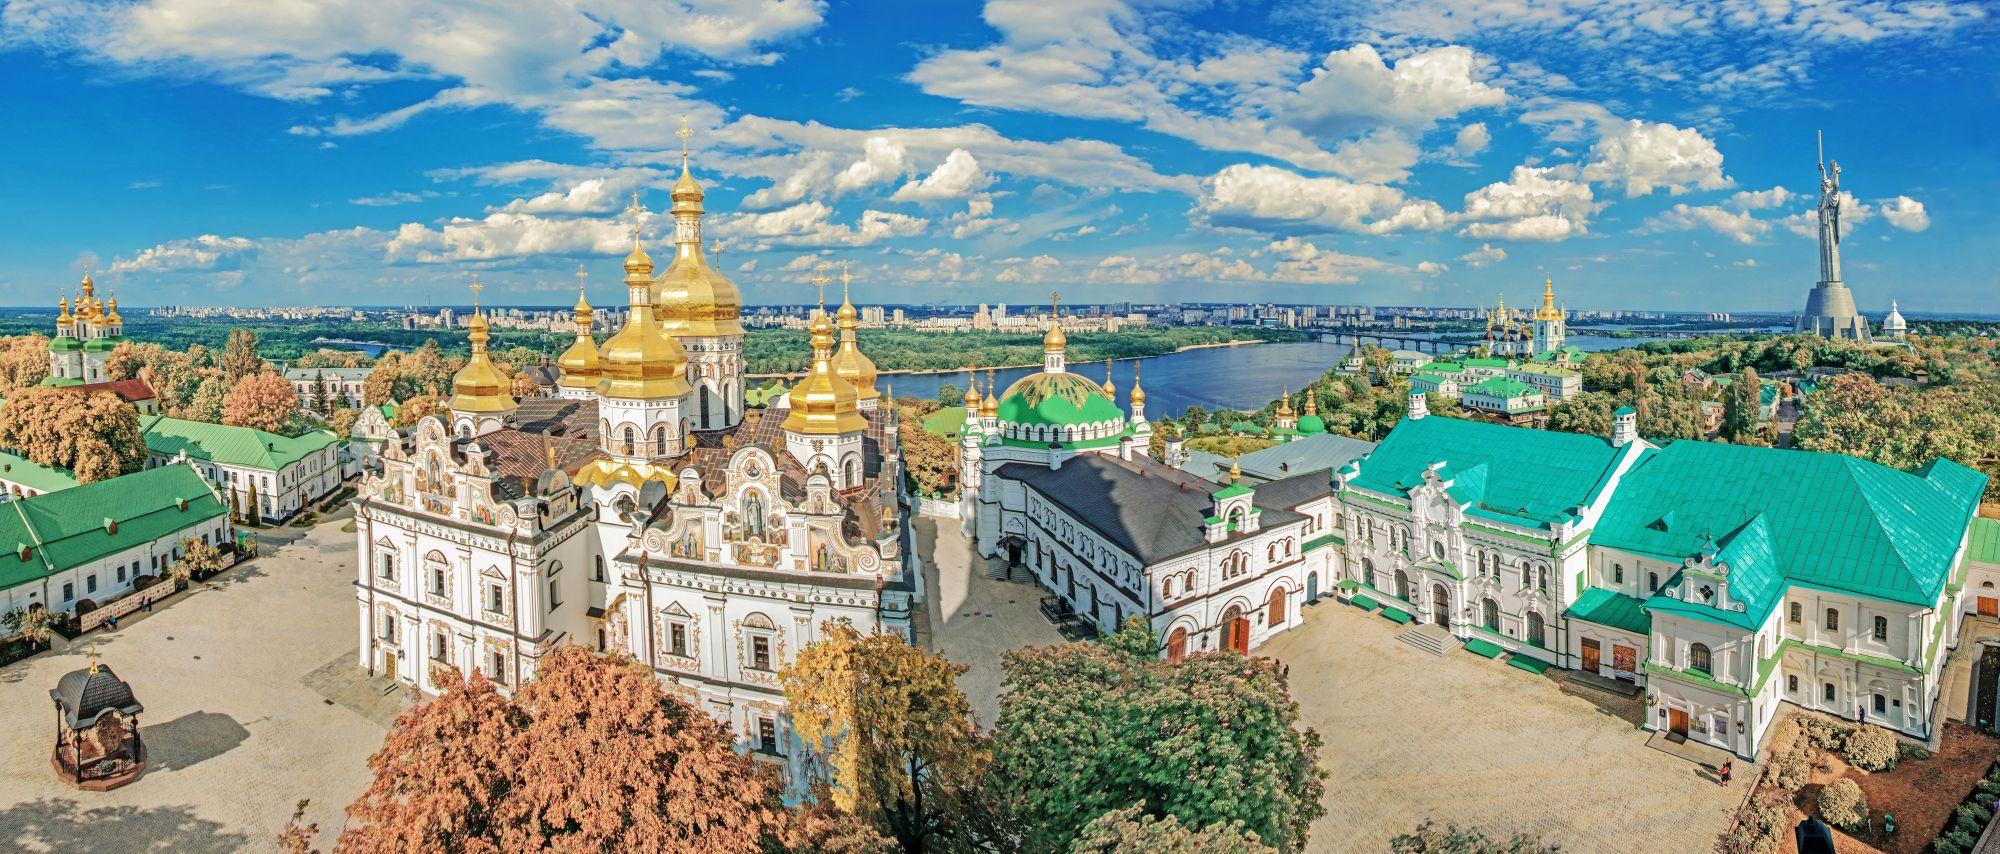 Kijów widok miasta